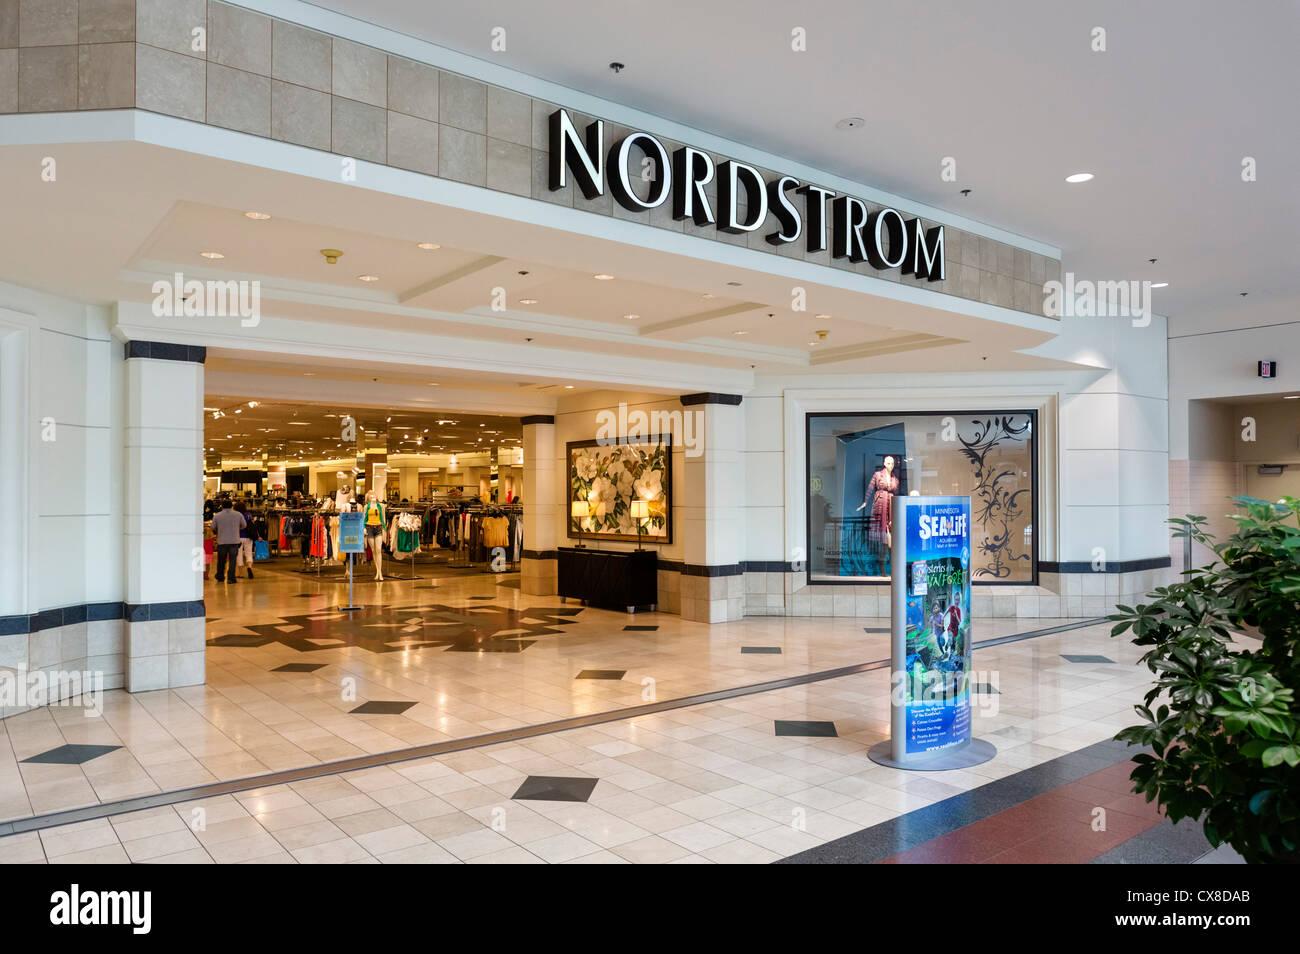 Nordstrom Rack Locations Dc Nordstrom Rack Locations Dc Nordstrom Rack Locations Dc Nordstrom